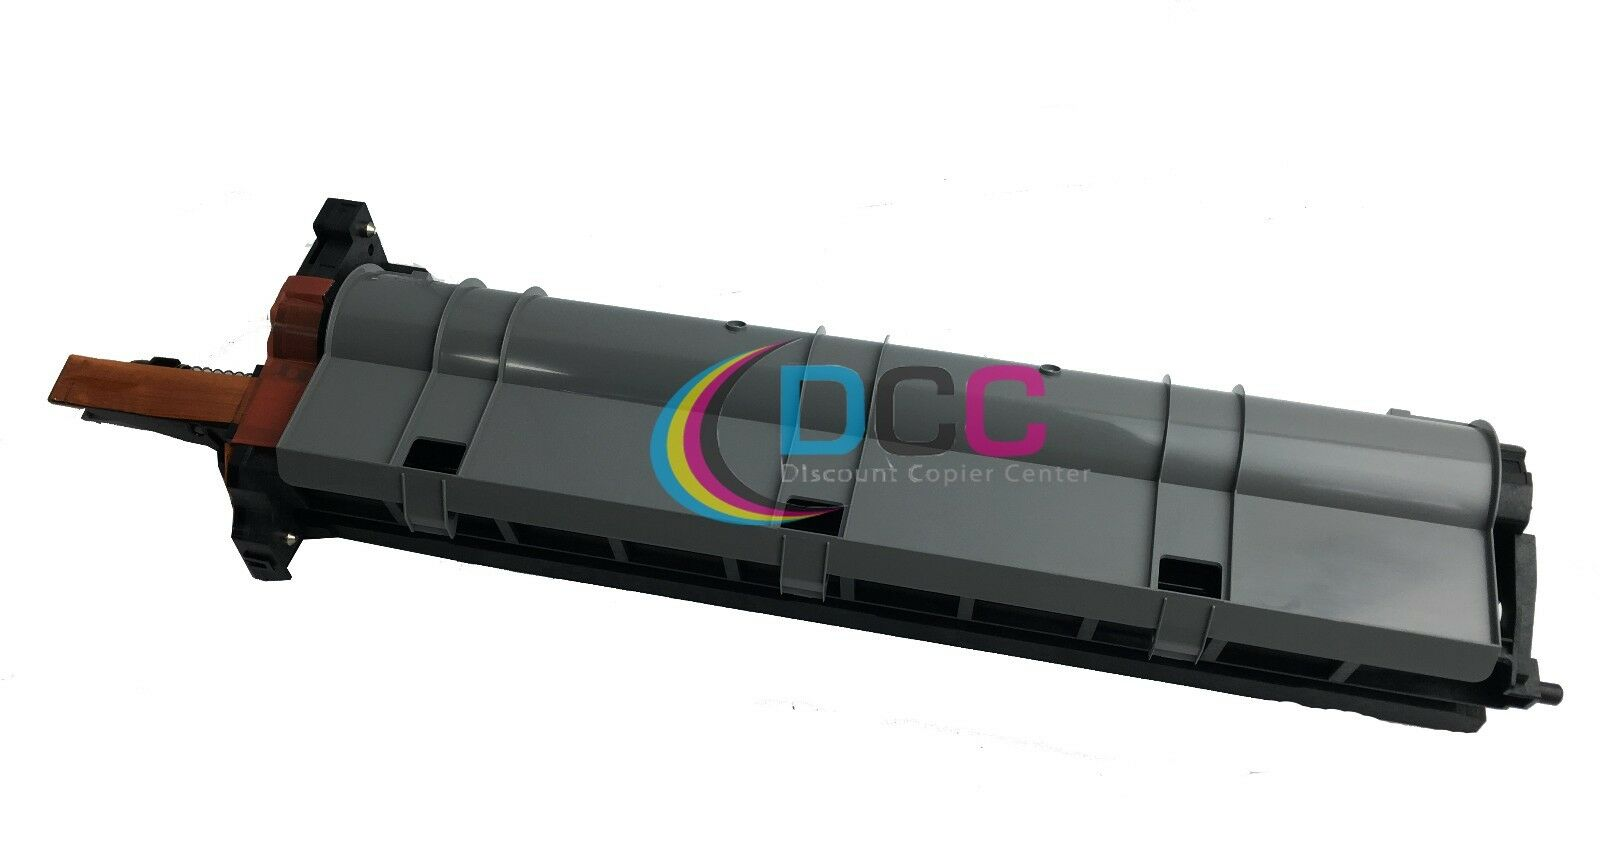 20PC X PCR Charge Roller Kyocera 3500i 3501i 4500i 4501i 5500i 5501i 6500i 6501i